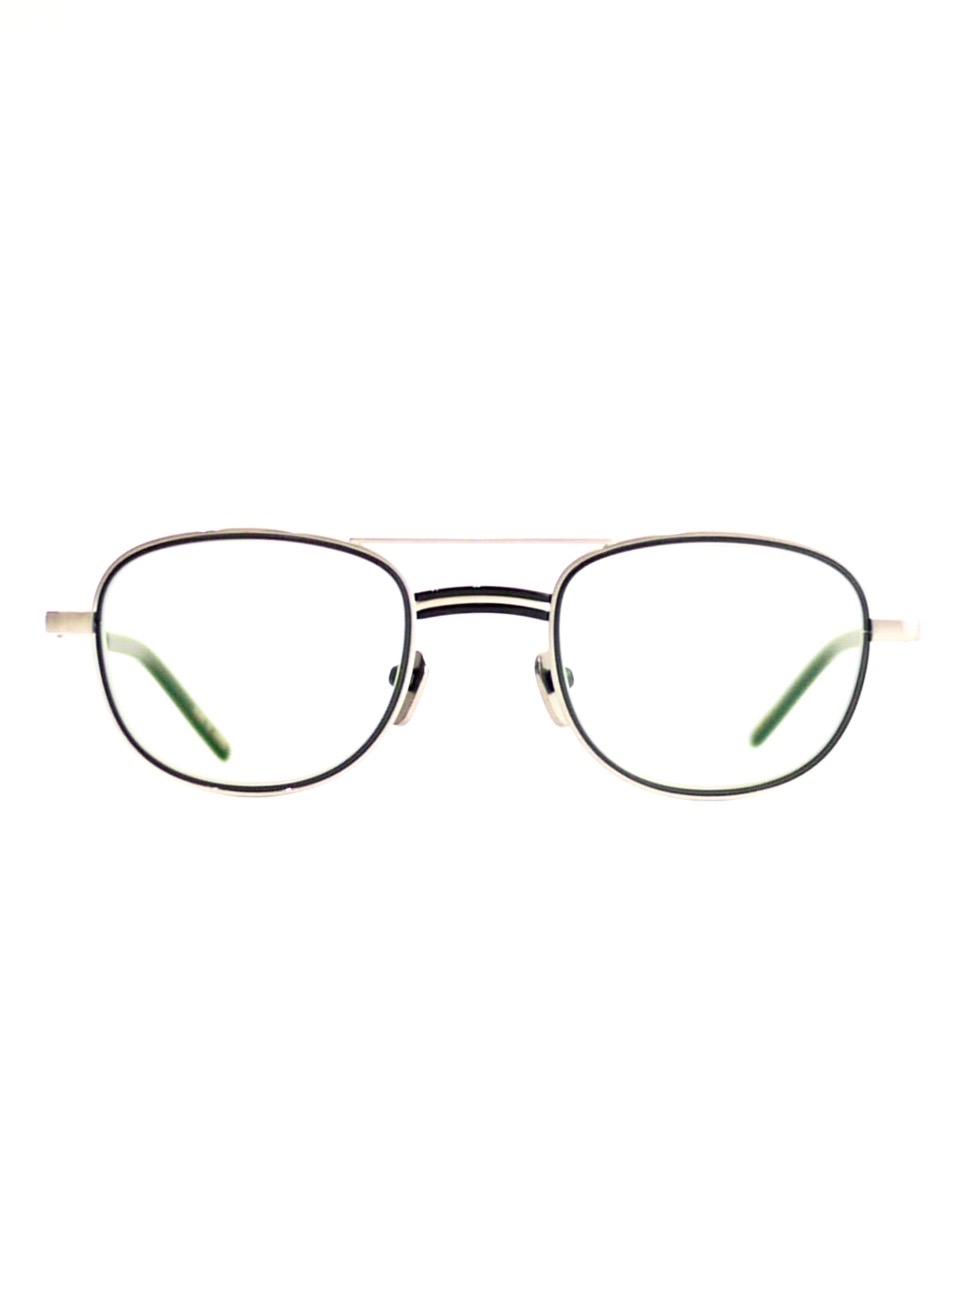 "kearny / james ""moss green""  (clear lens)"